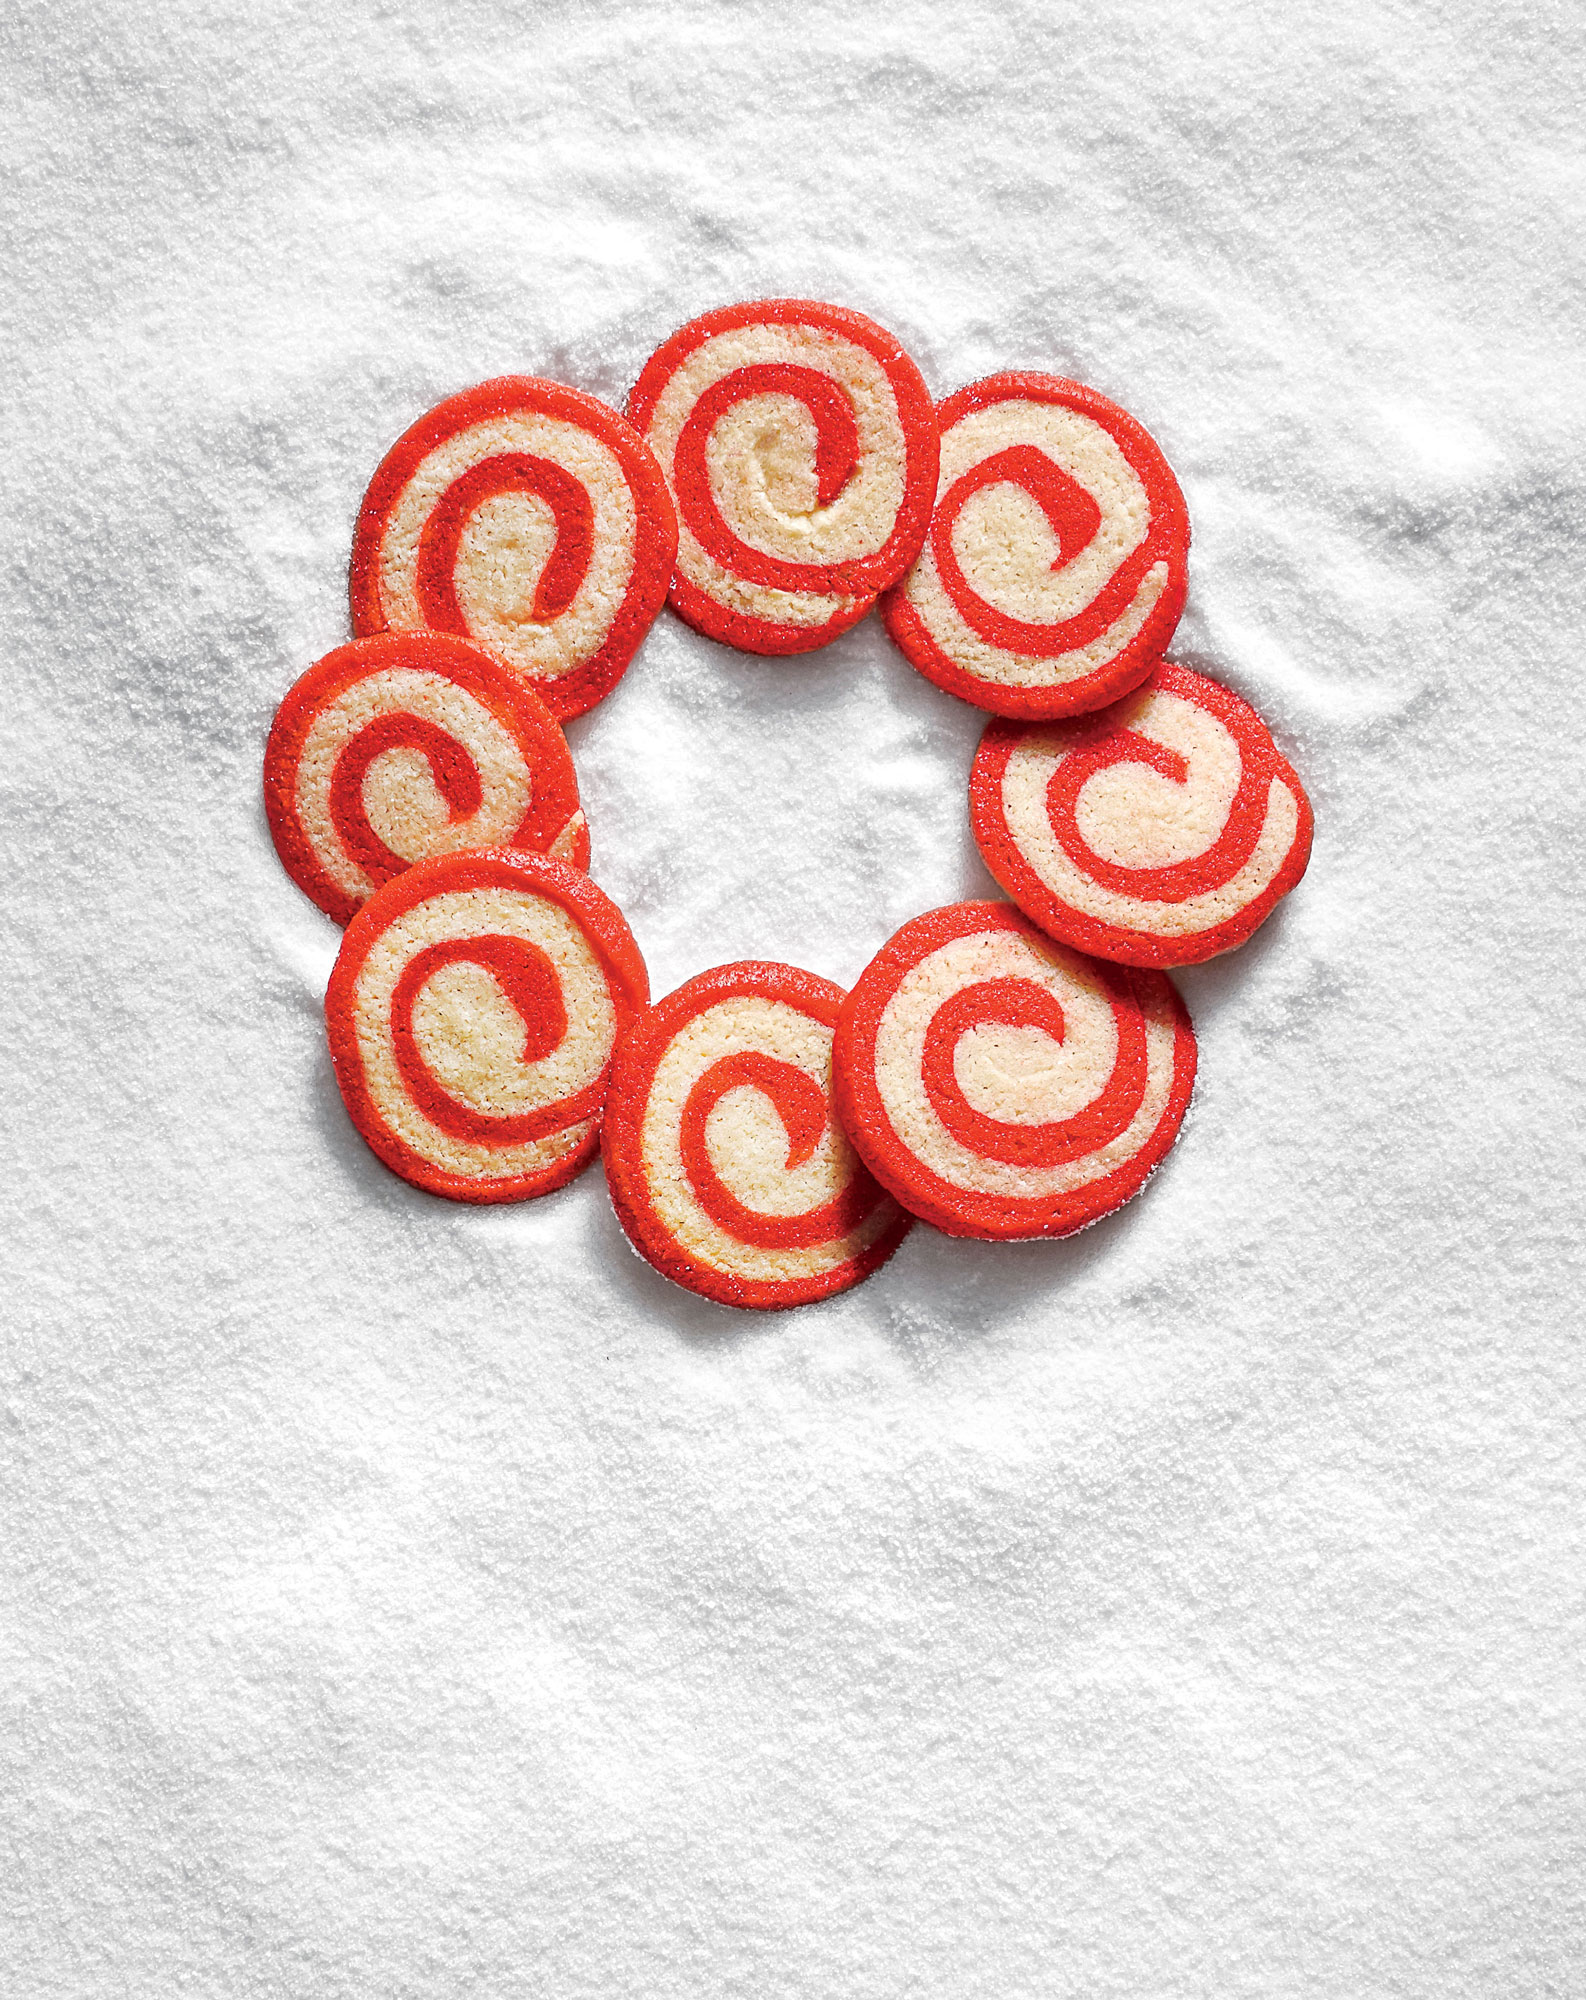 Peppermint Pinwheels image